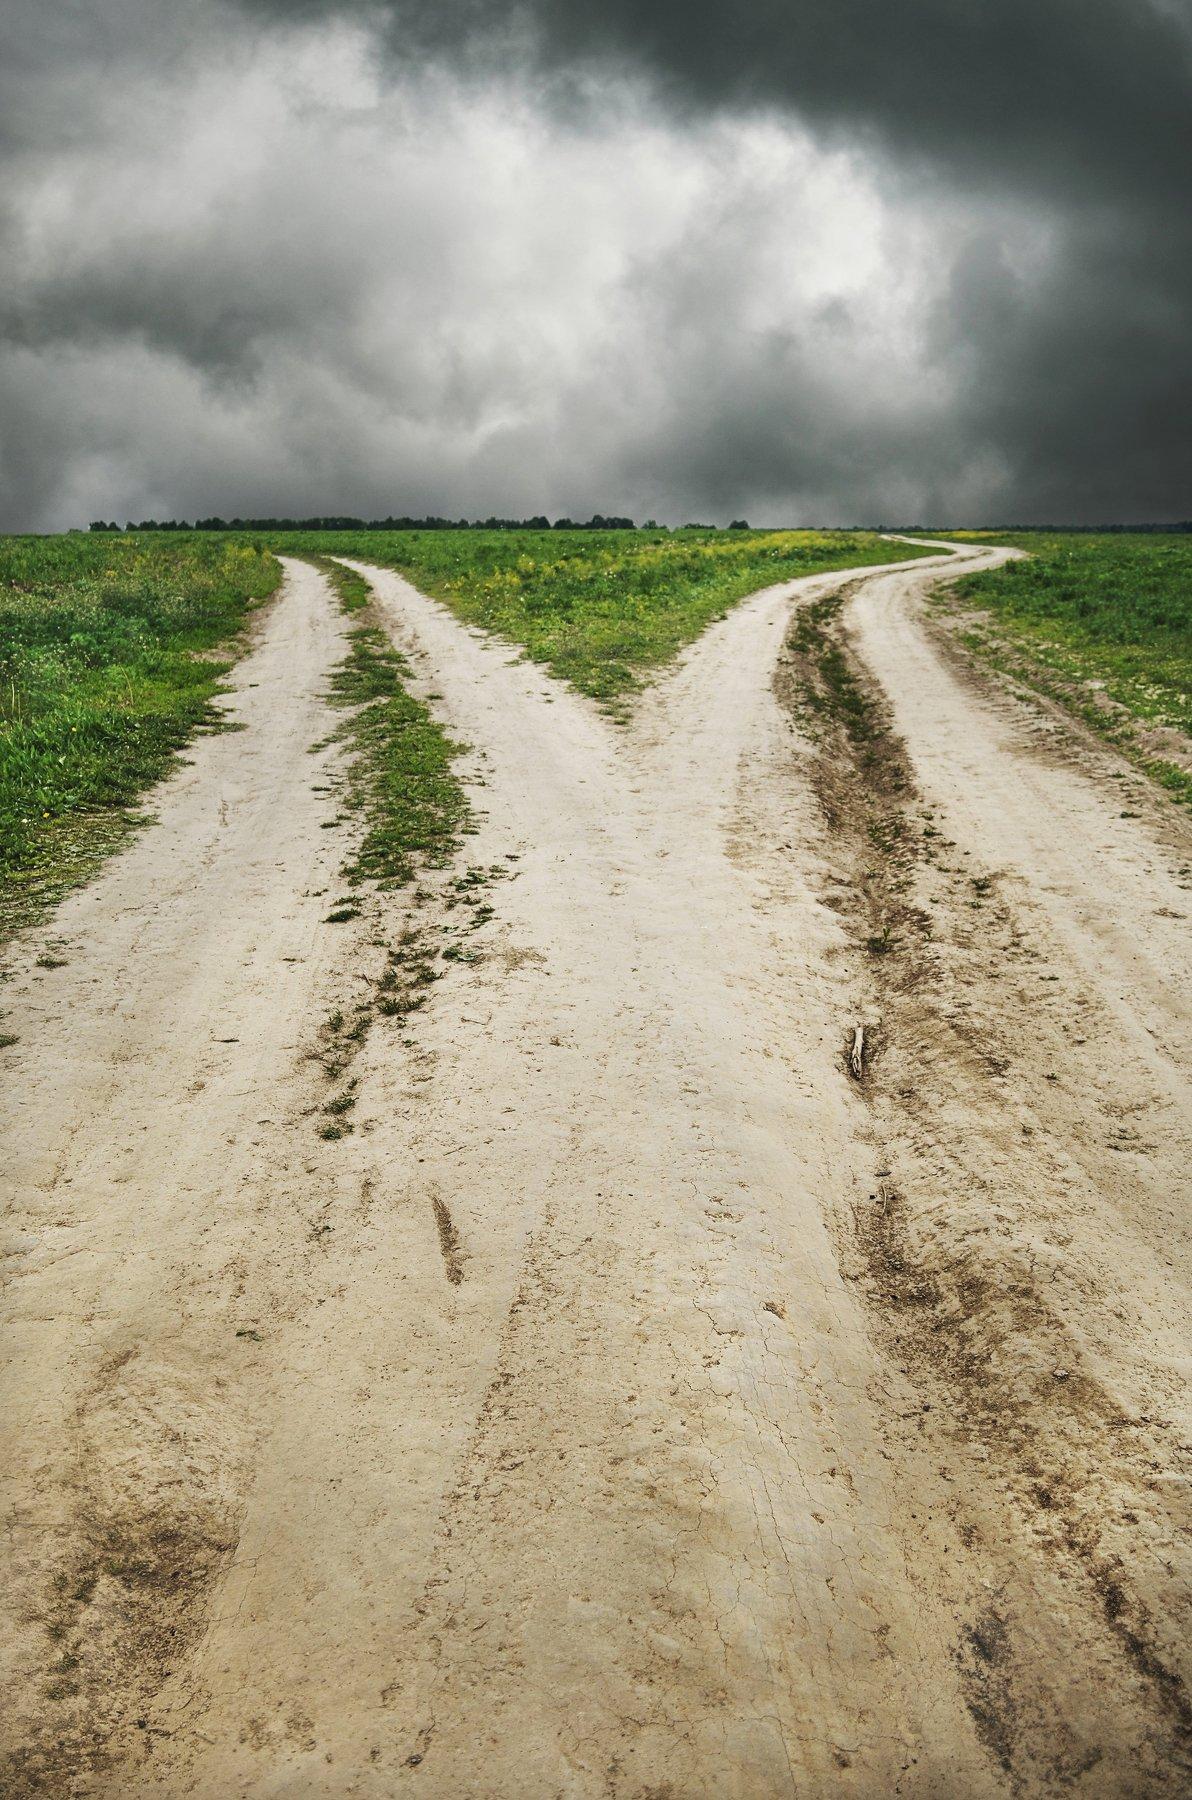 дороги, перепутье, деревня, природа, горизонт, небо, тучи, поле, лес, анна салтыкова, весна, Анна Сергеевна Салтыкова (Анка)